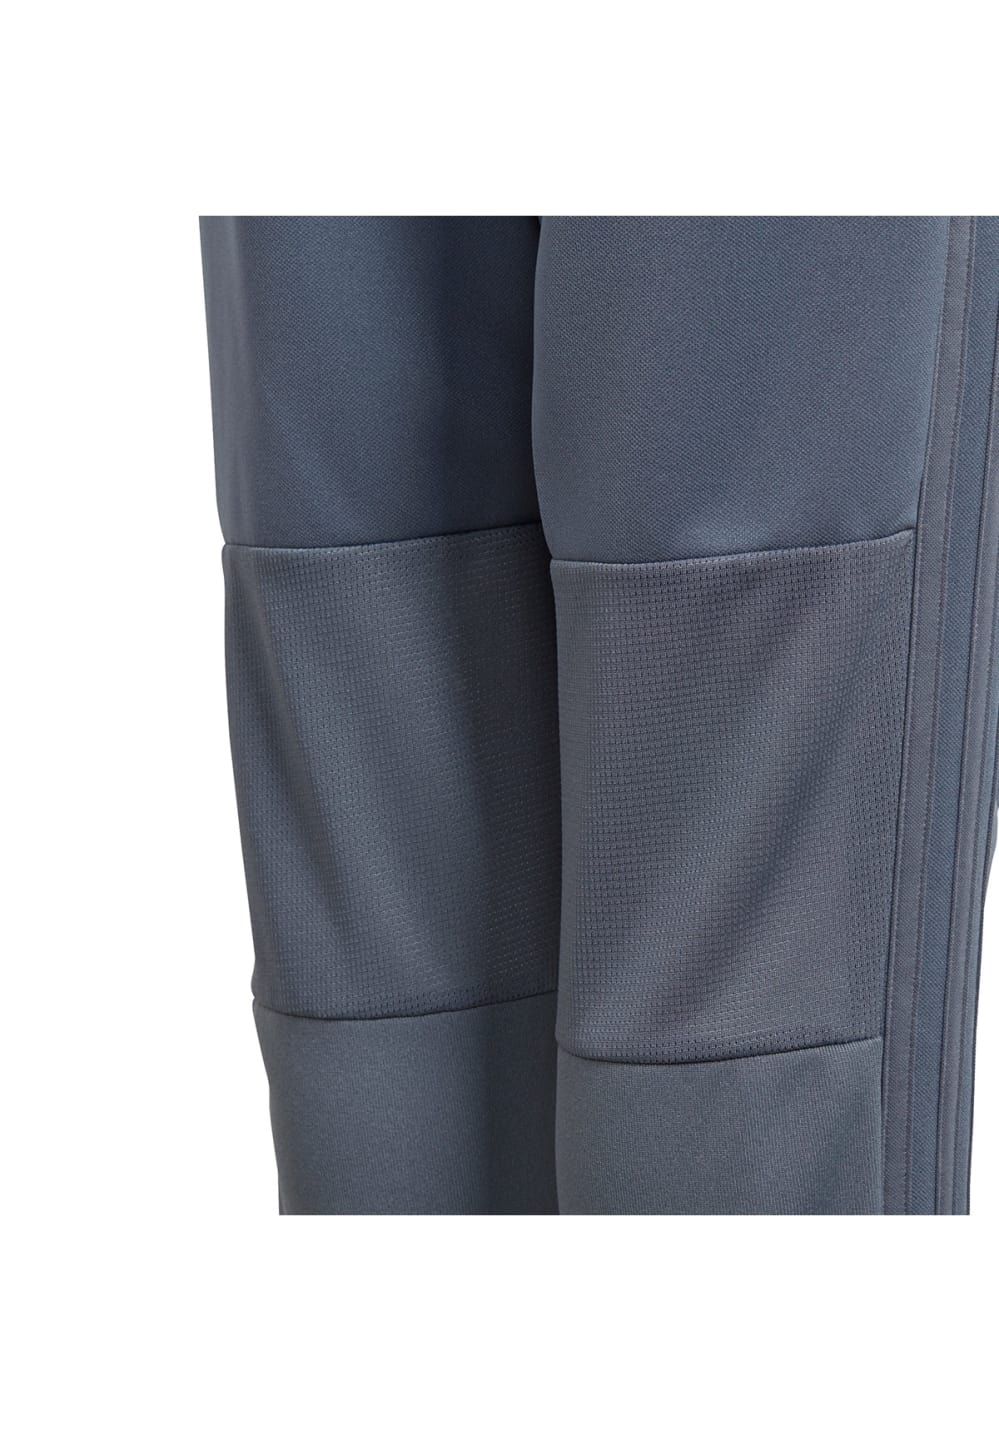 Condivo Trainingshose Fitness Adidas Gris 18 Pantalons yvw8Omn0N